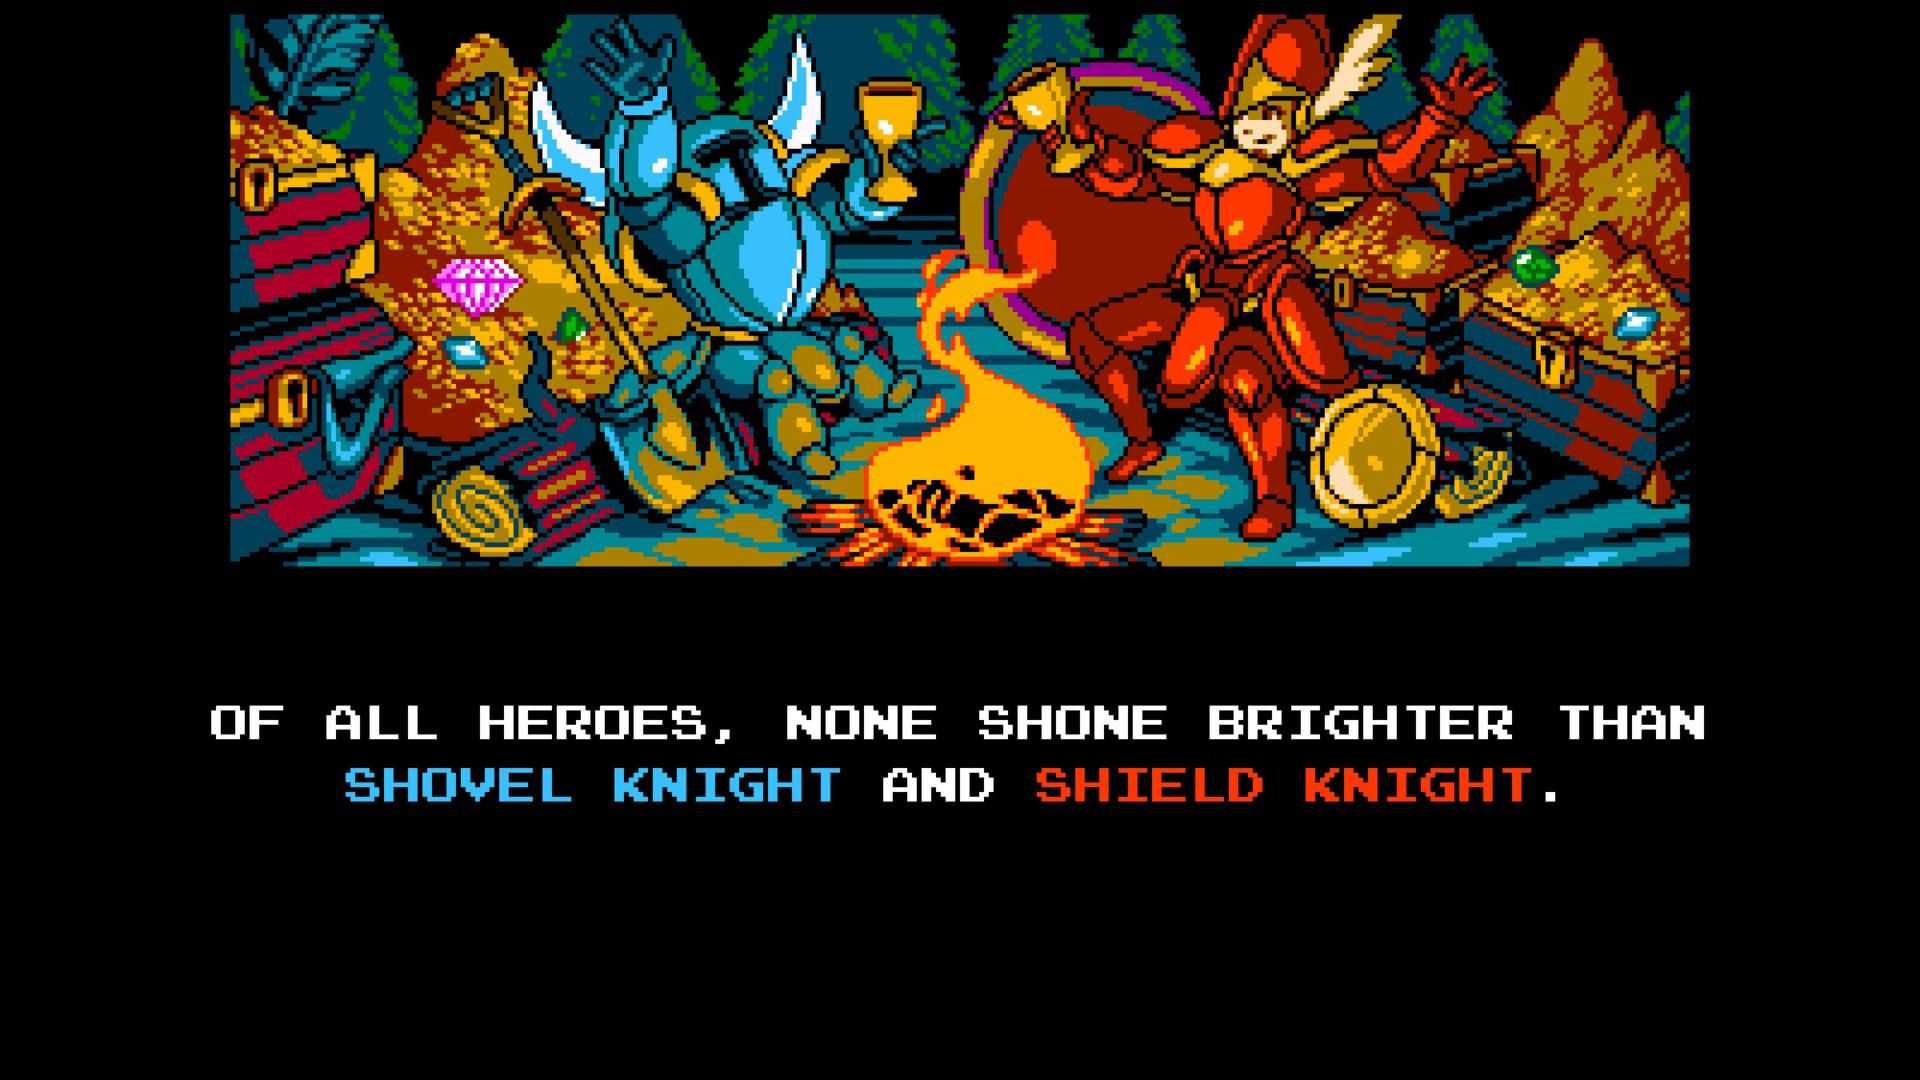 Shovel Knight (2014)